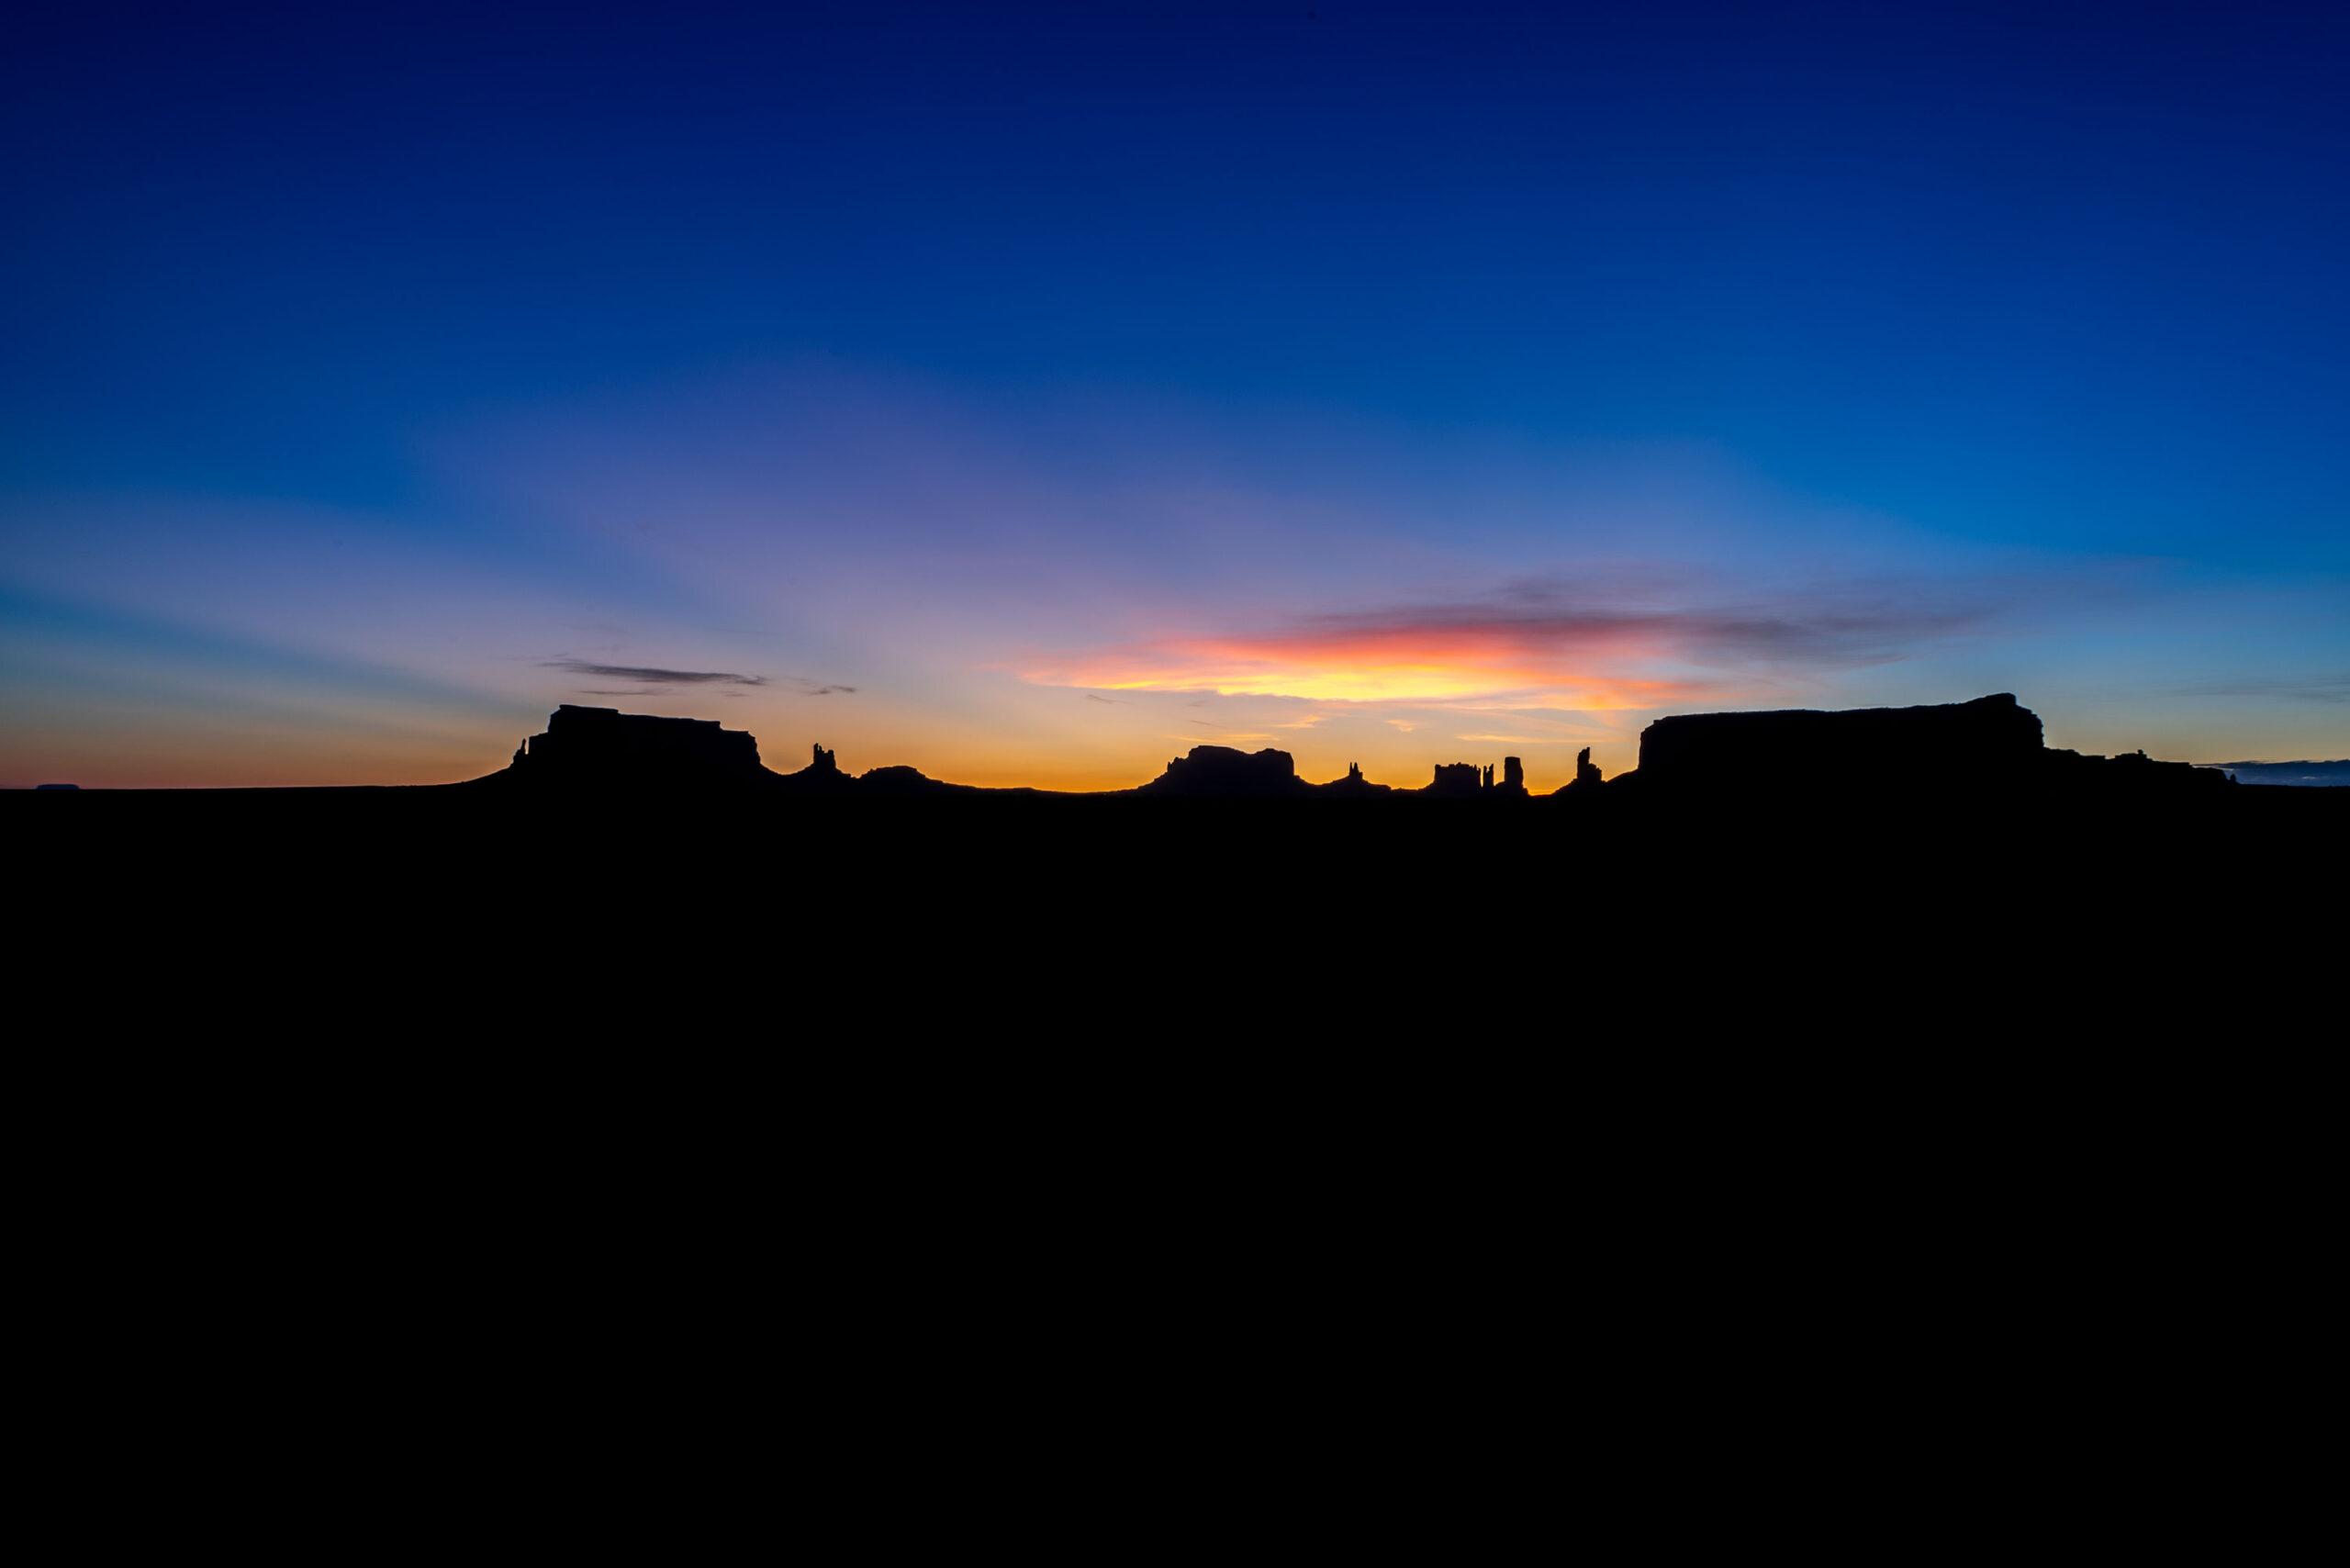 Sunrise landscape photography of Monument valley taken by Jennifer Esseiva.